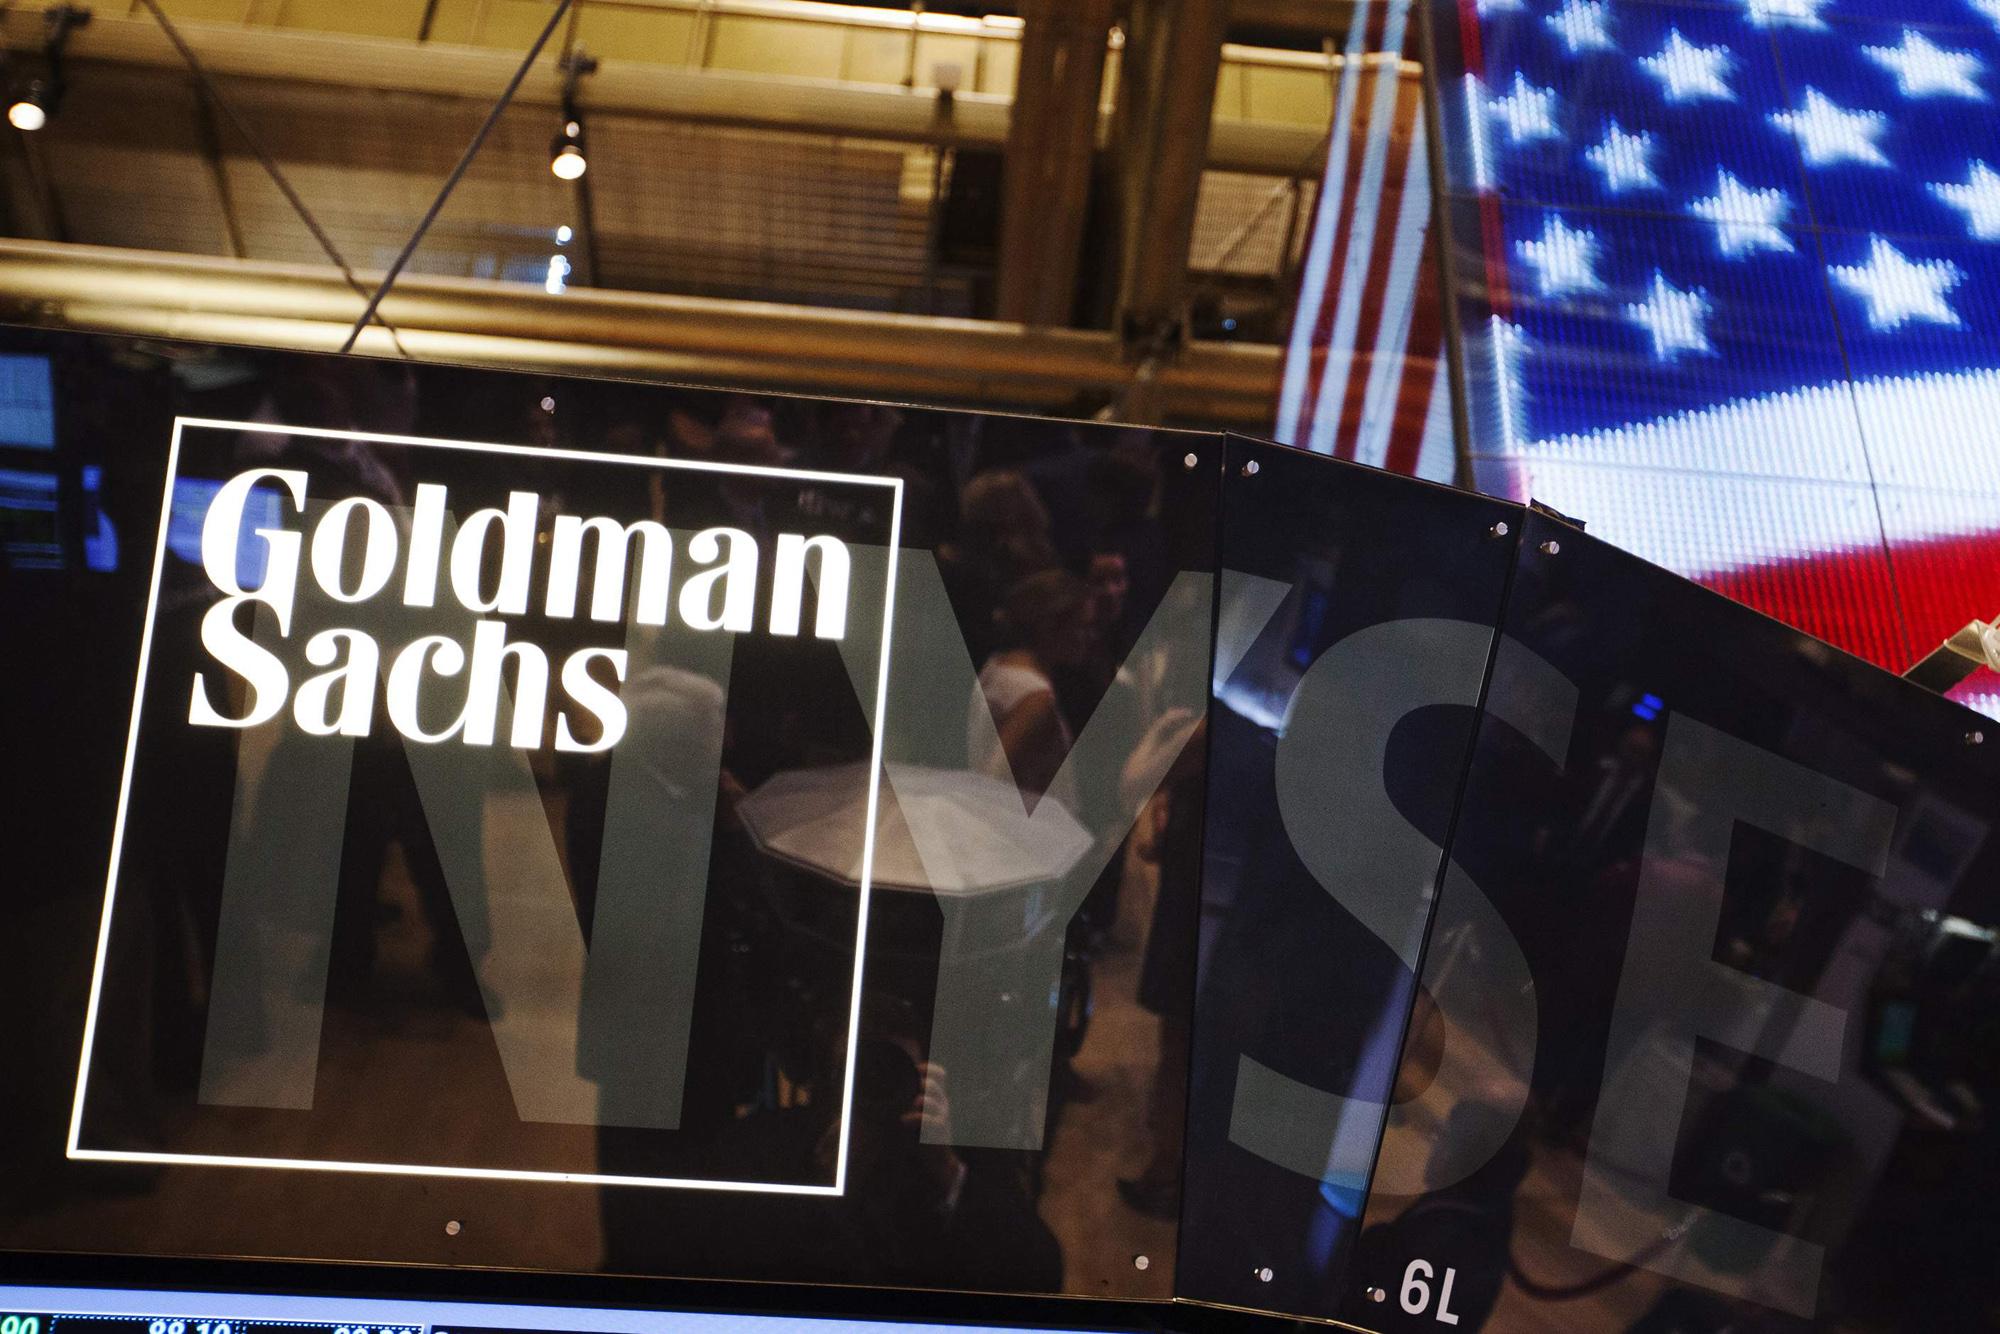 http://comparic.pl/wp-content/uploads/2014/08/goldmansachs.jpg